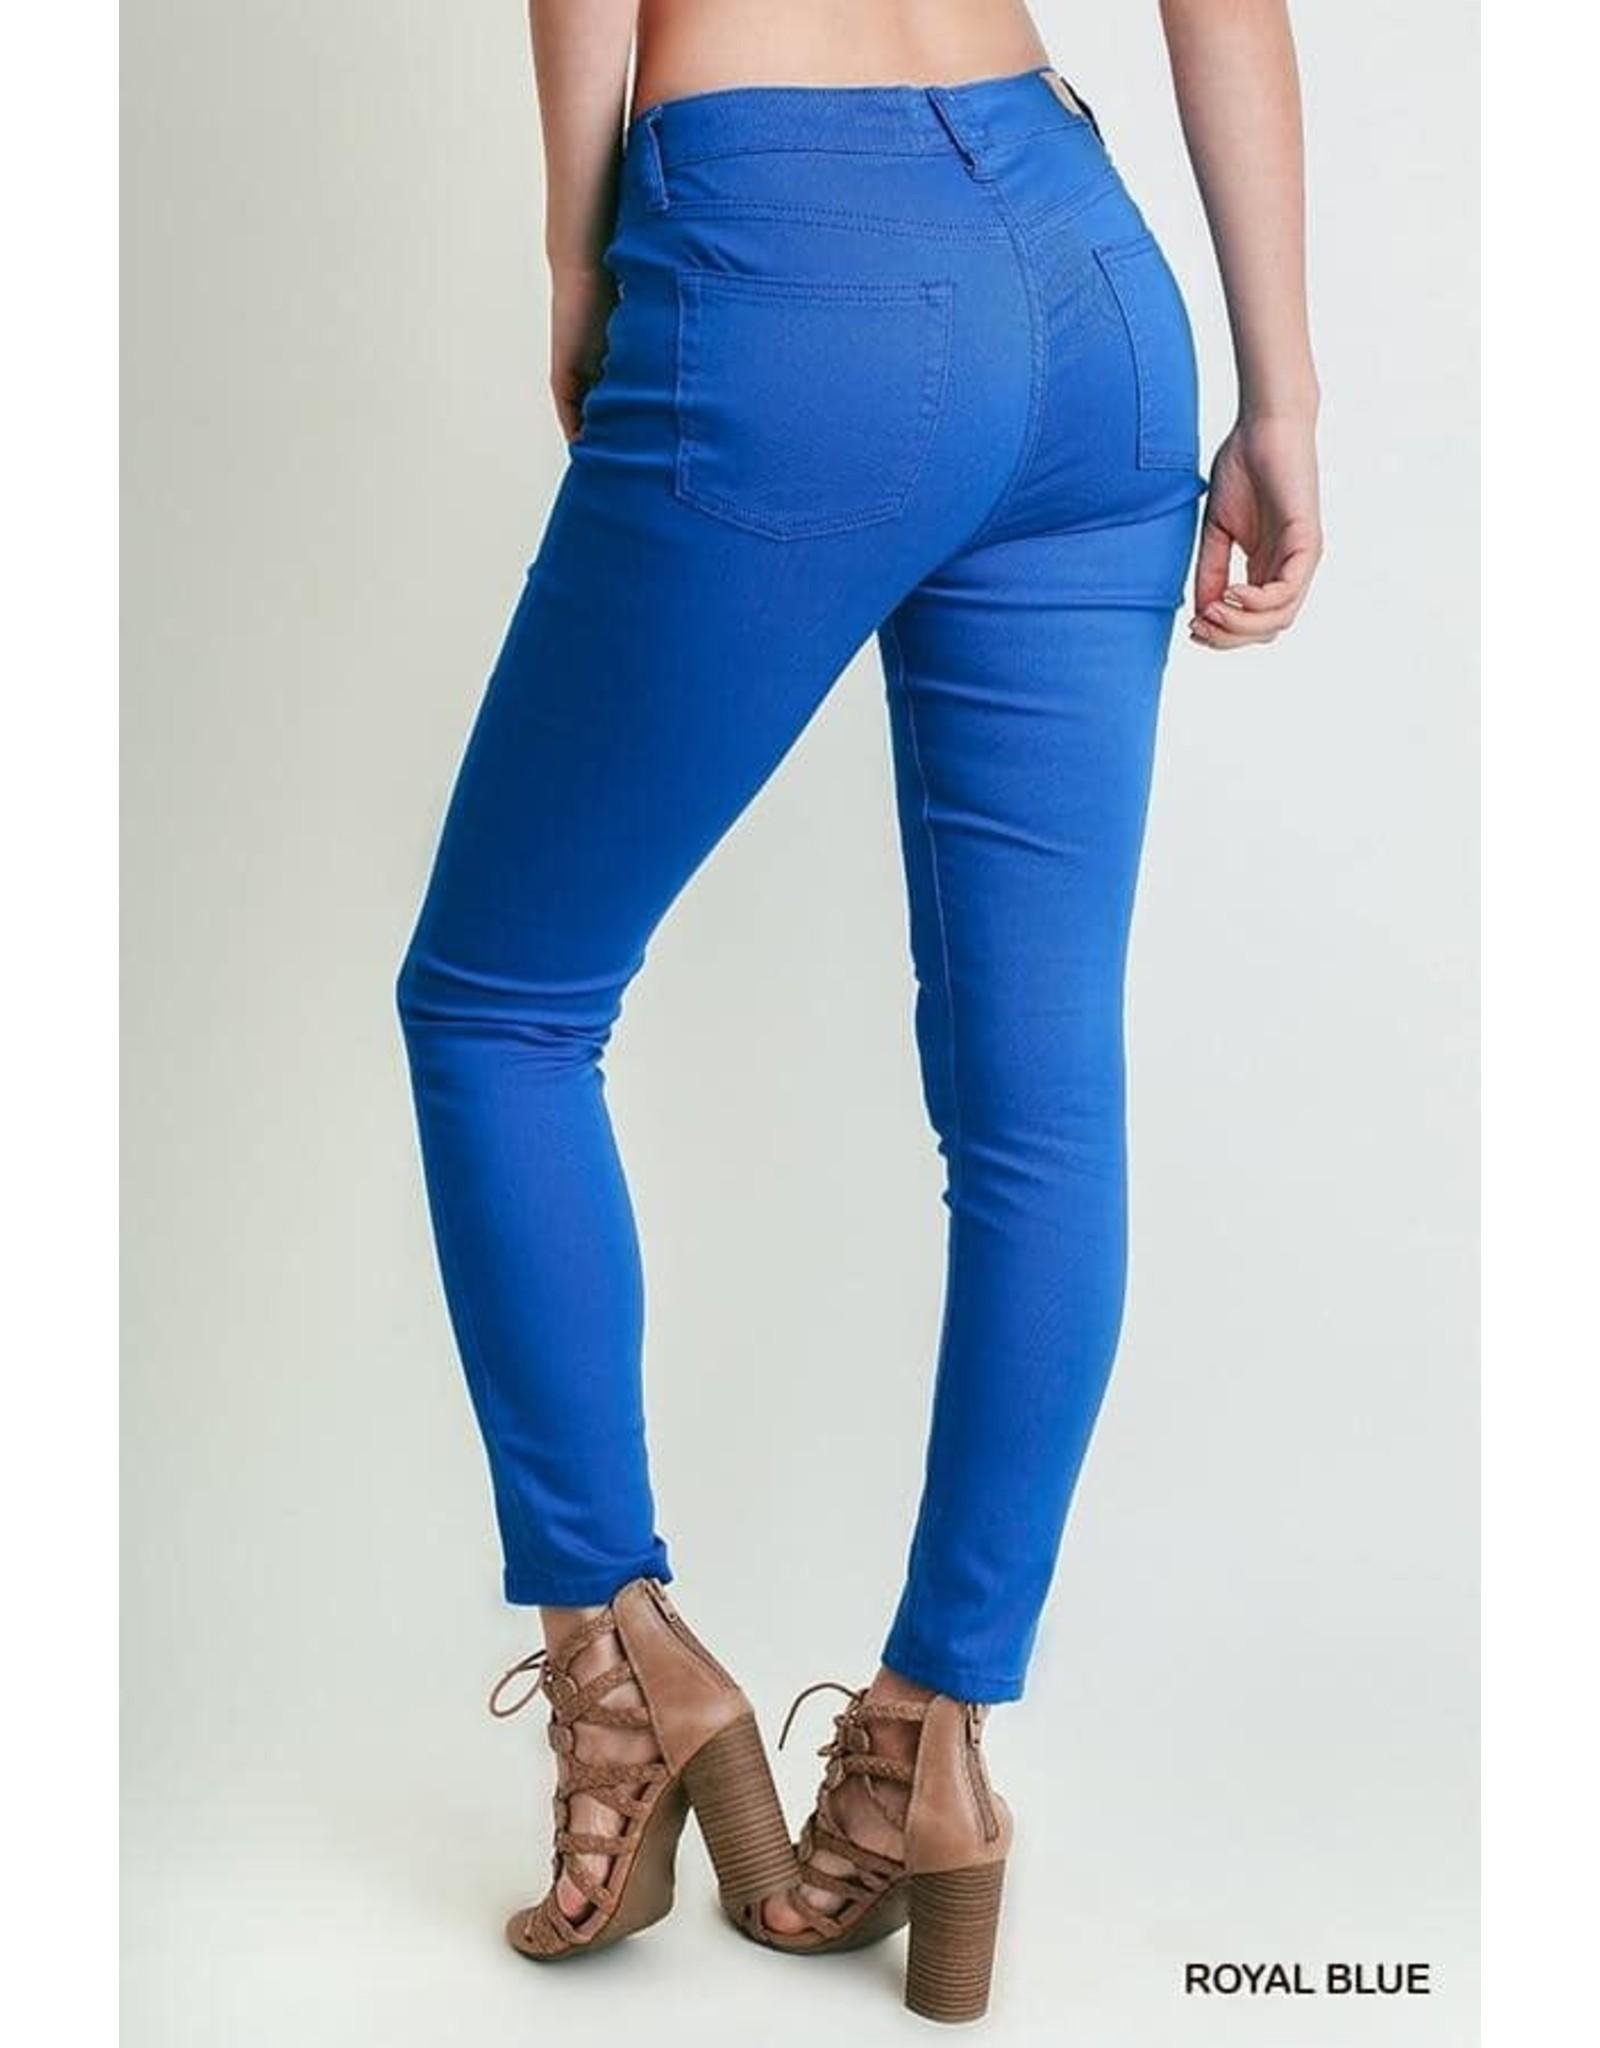 Basic 5 Pocket Stretch Skinny Jeans